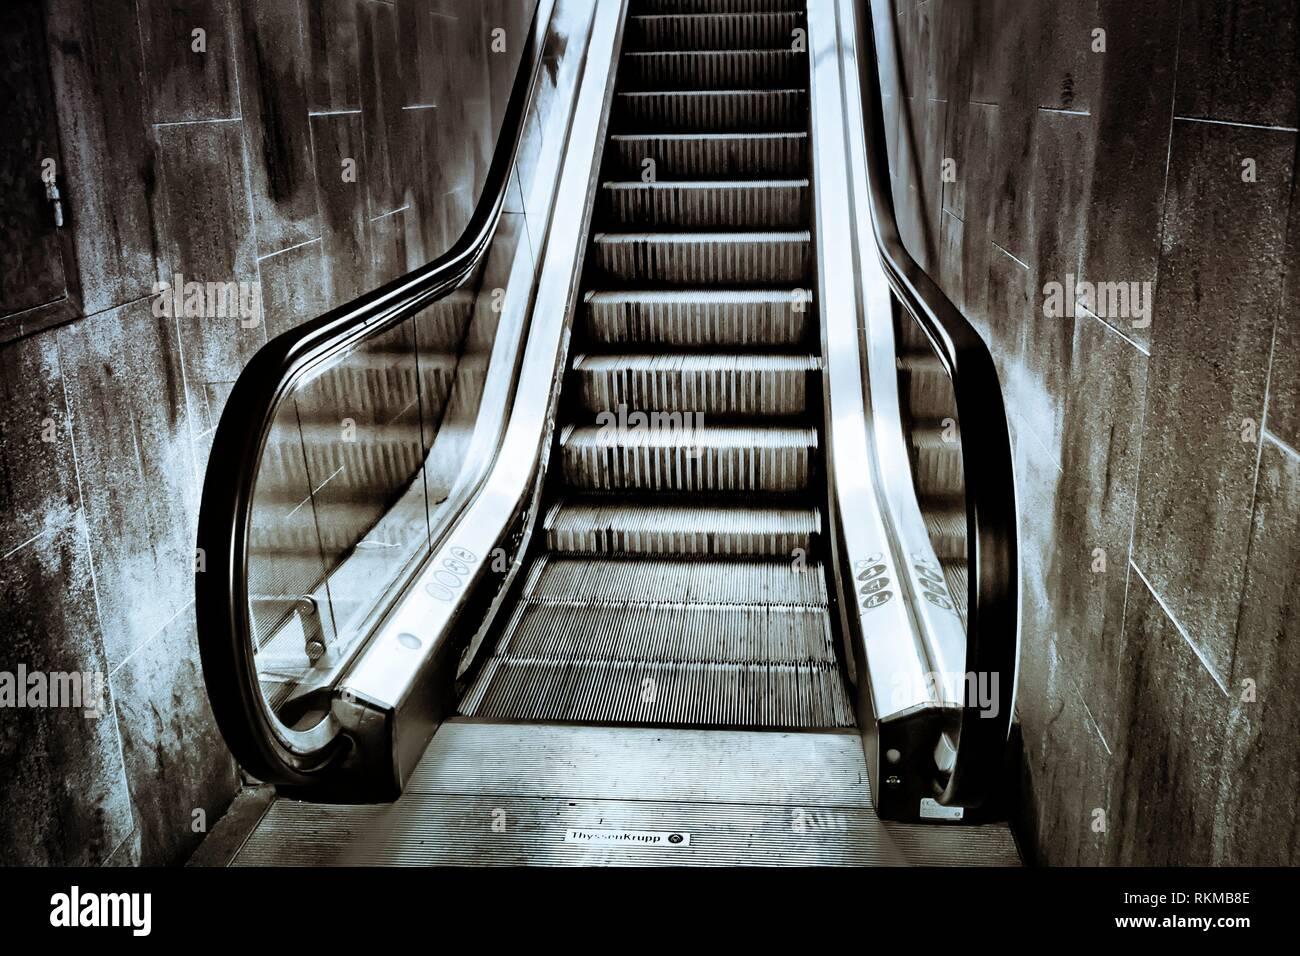 Escalator. Barcelona province, Catalonia, Spain. - Stock Image